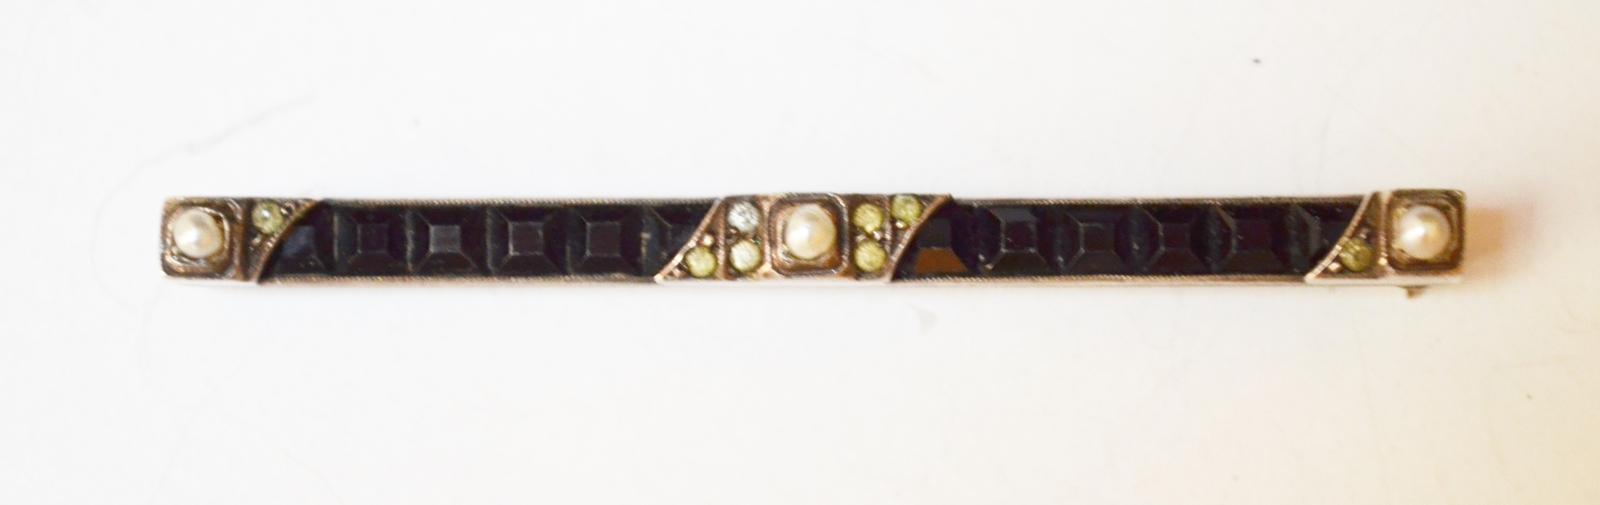 Onyx pin